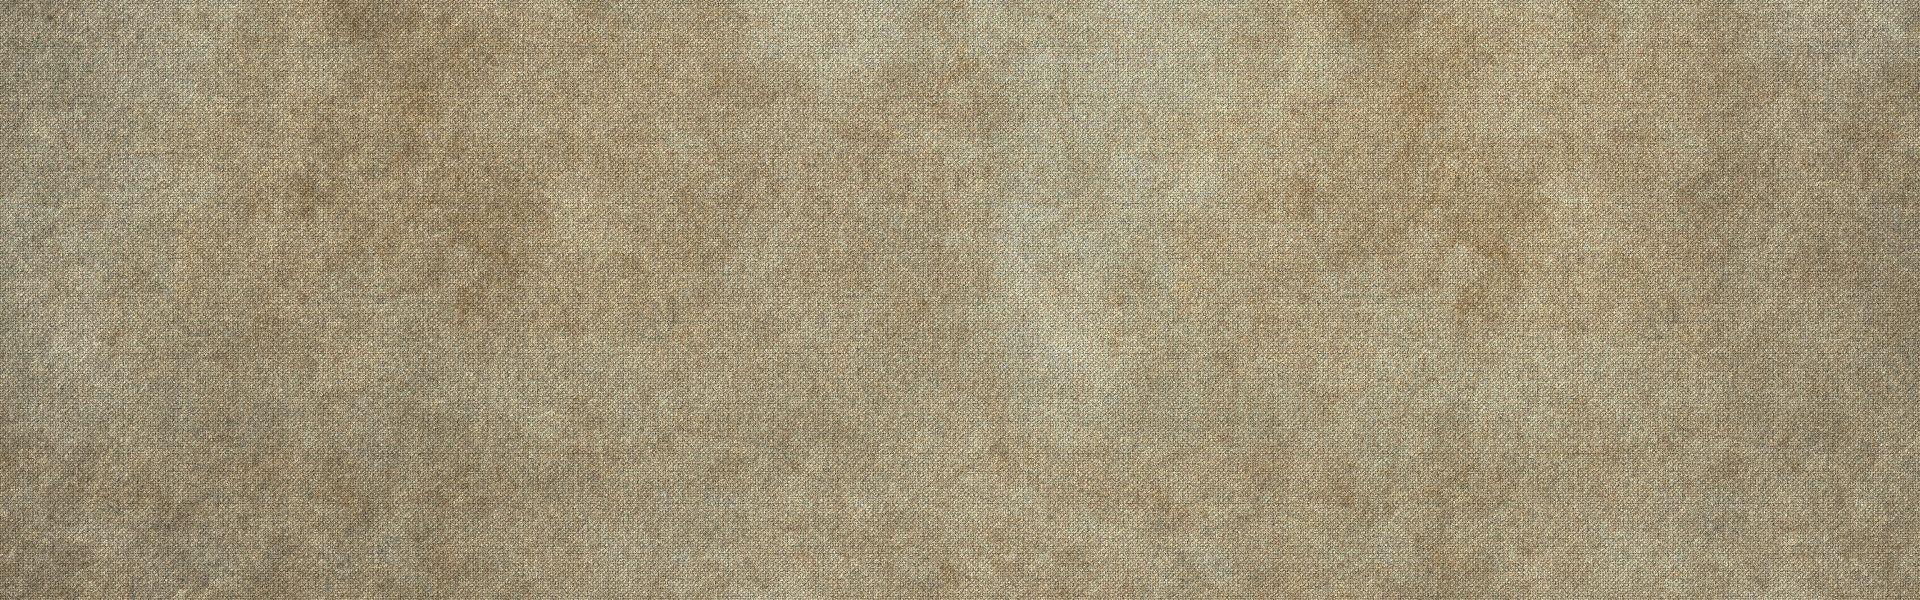 Rough Paper Texture Rough Paper Texture Paper Texture Vintage Paper Textures